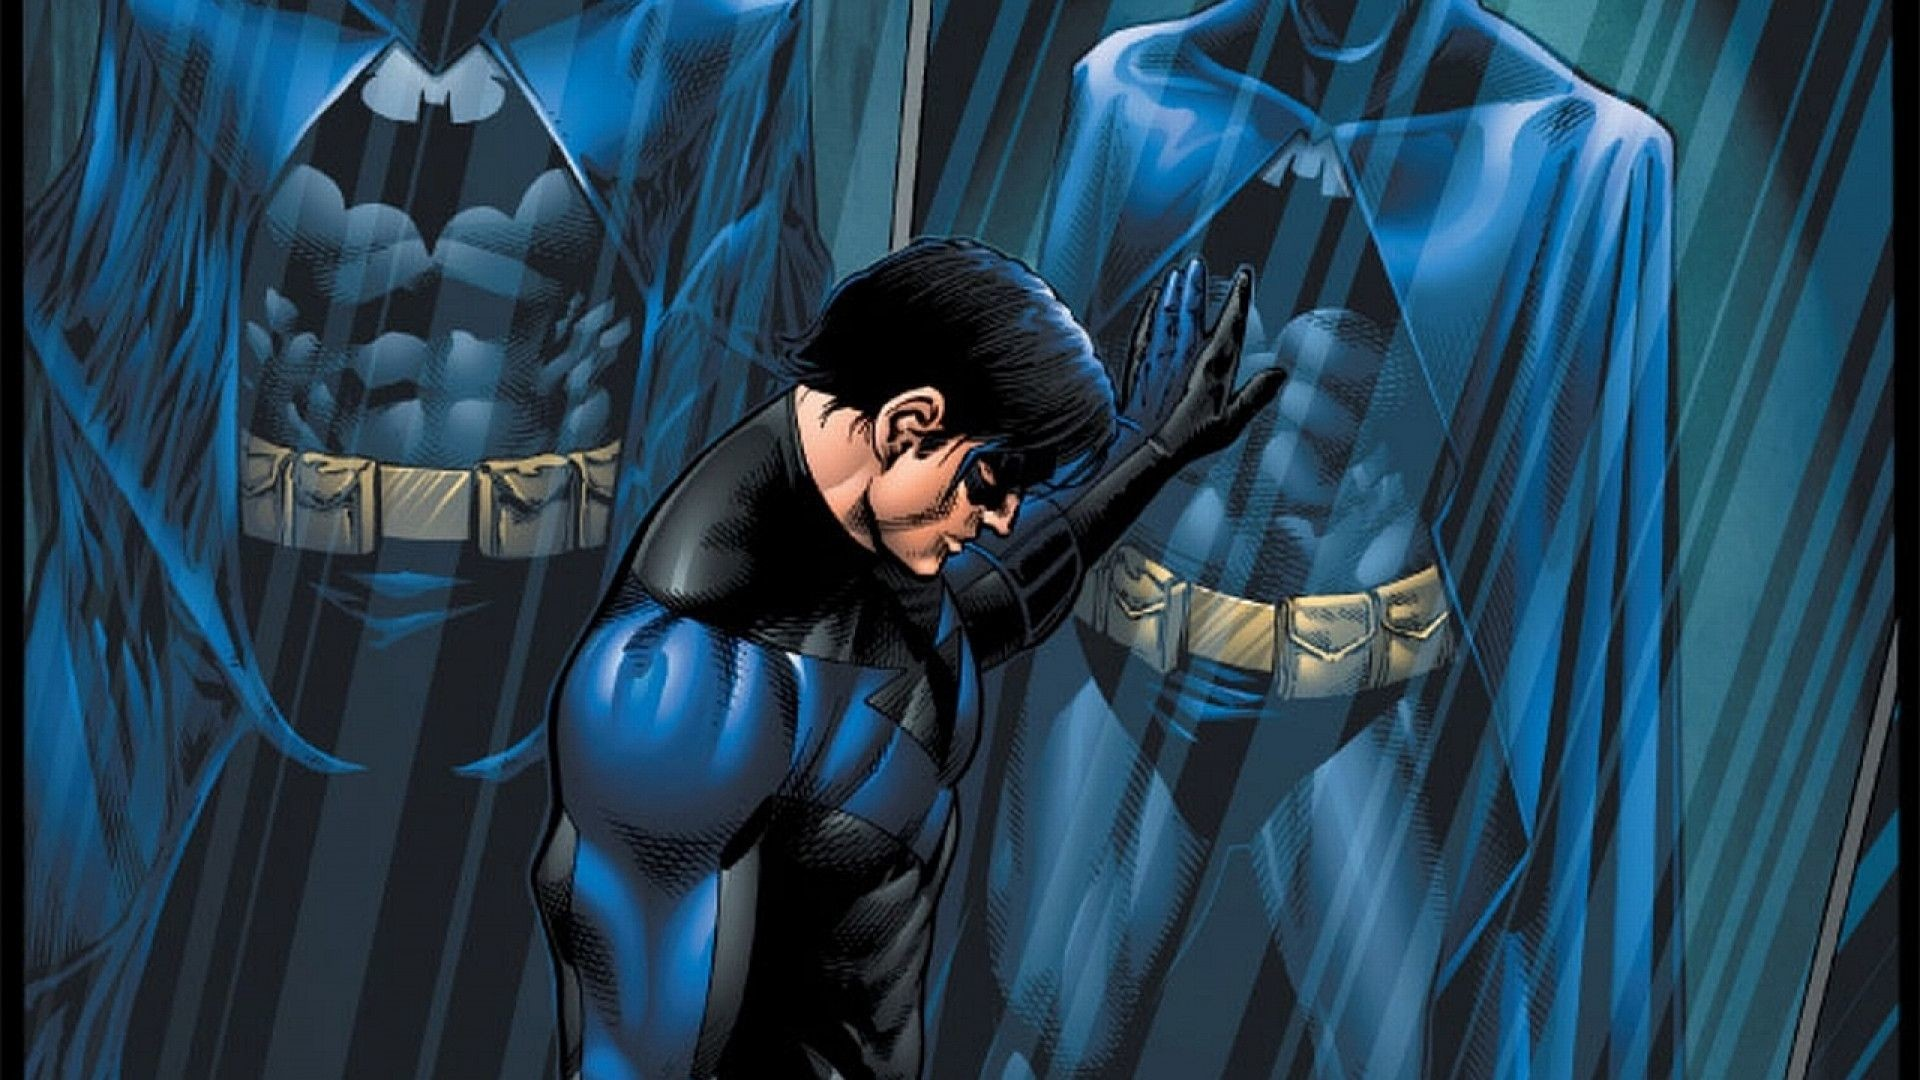 Batman Nightwing Wallpaper 1920×1080